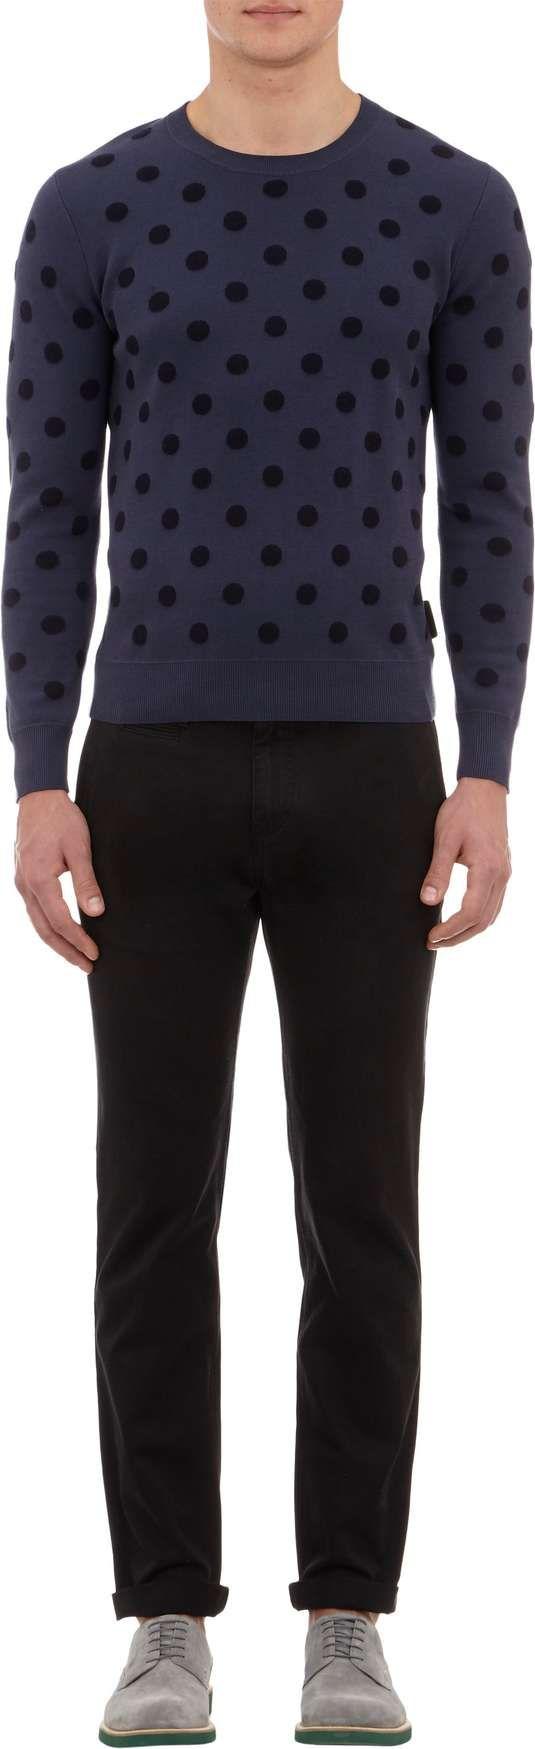 Dots for Men | Burberry Brit Polka Dot Sweatshirt on Wantering #menssweatshirt #mensstyle #mensfashion #menswear #burberry #wantering http://www.wantering.com/mens-clothing-item/polka-dot-sweatshirt/ahIDp/